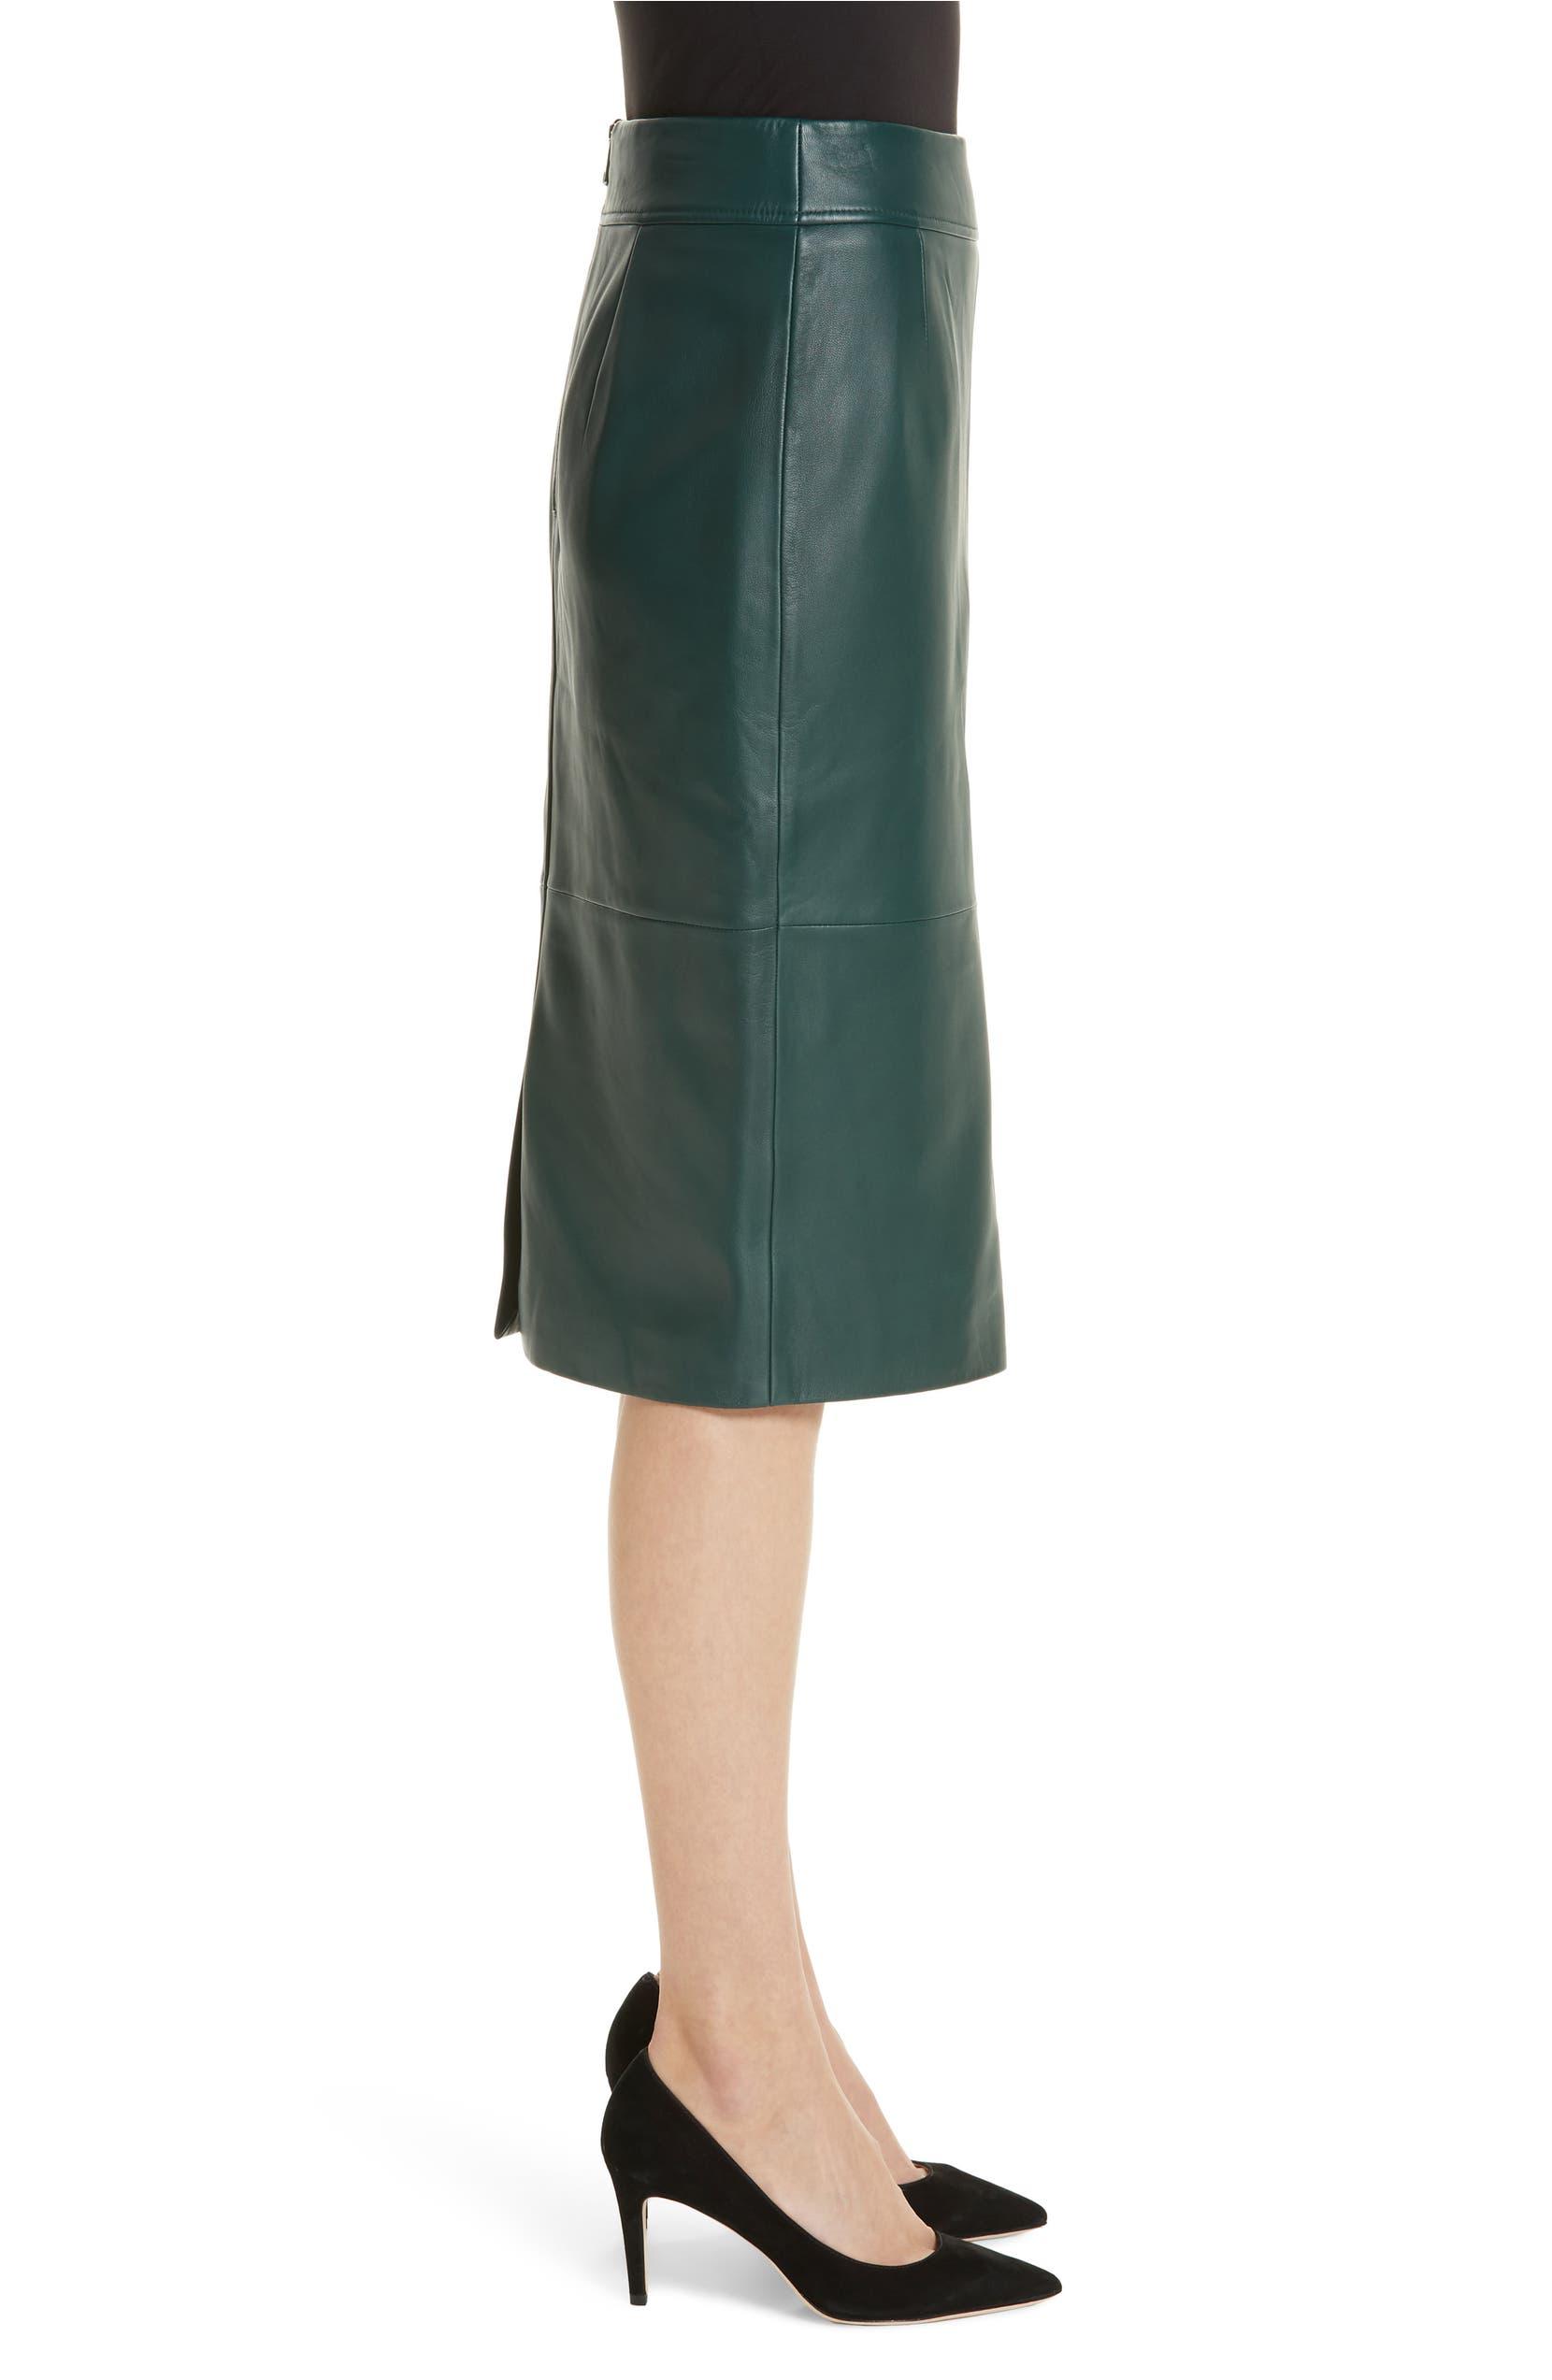 dirt cheap rich and magnificent super popular Selrita Lambskin Leather Pencil Skirt